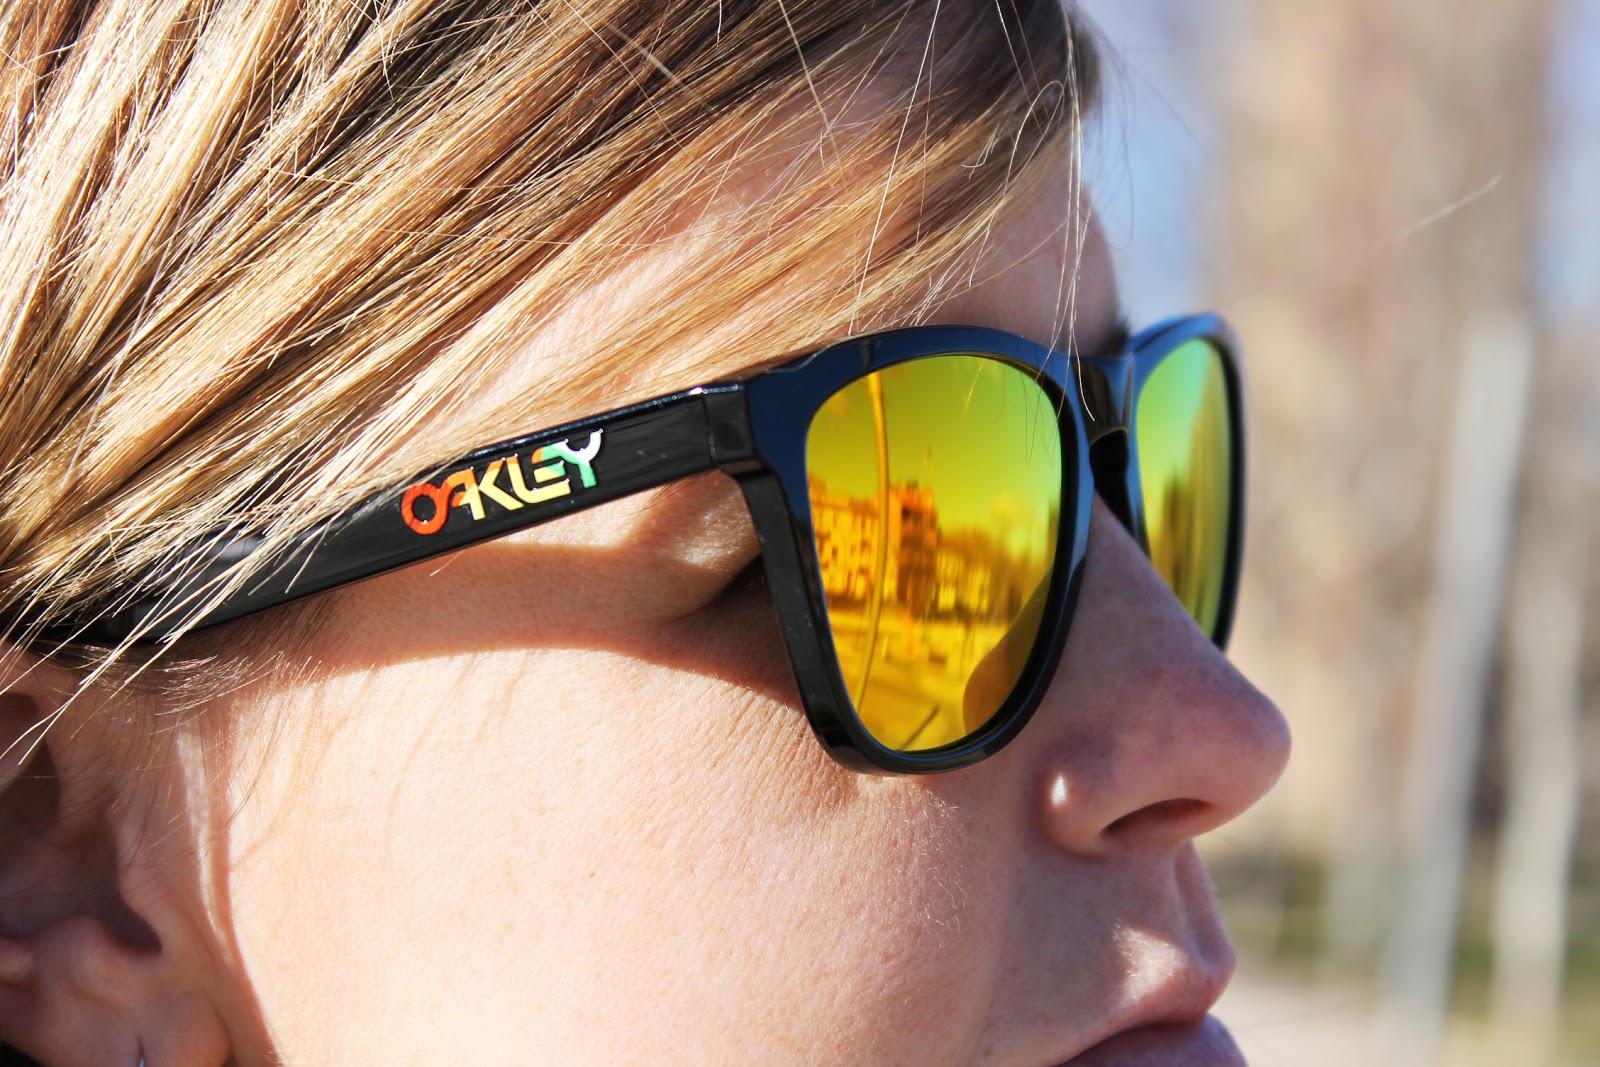 Gafas Oakley Espejo